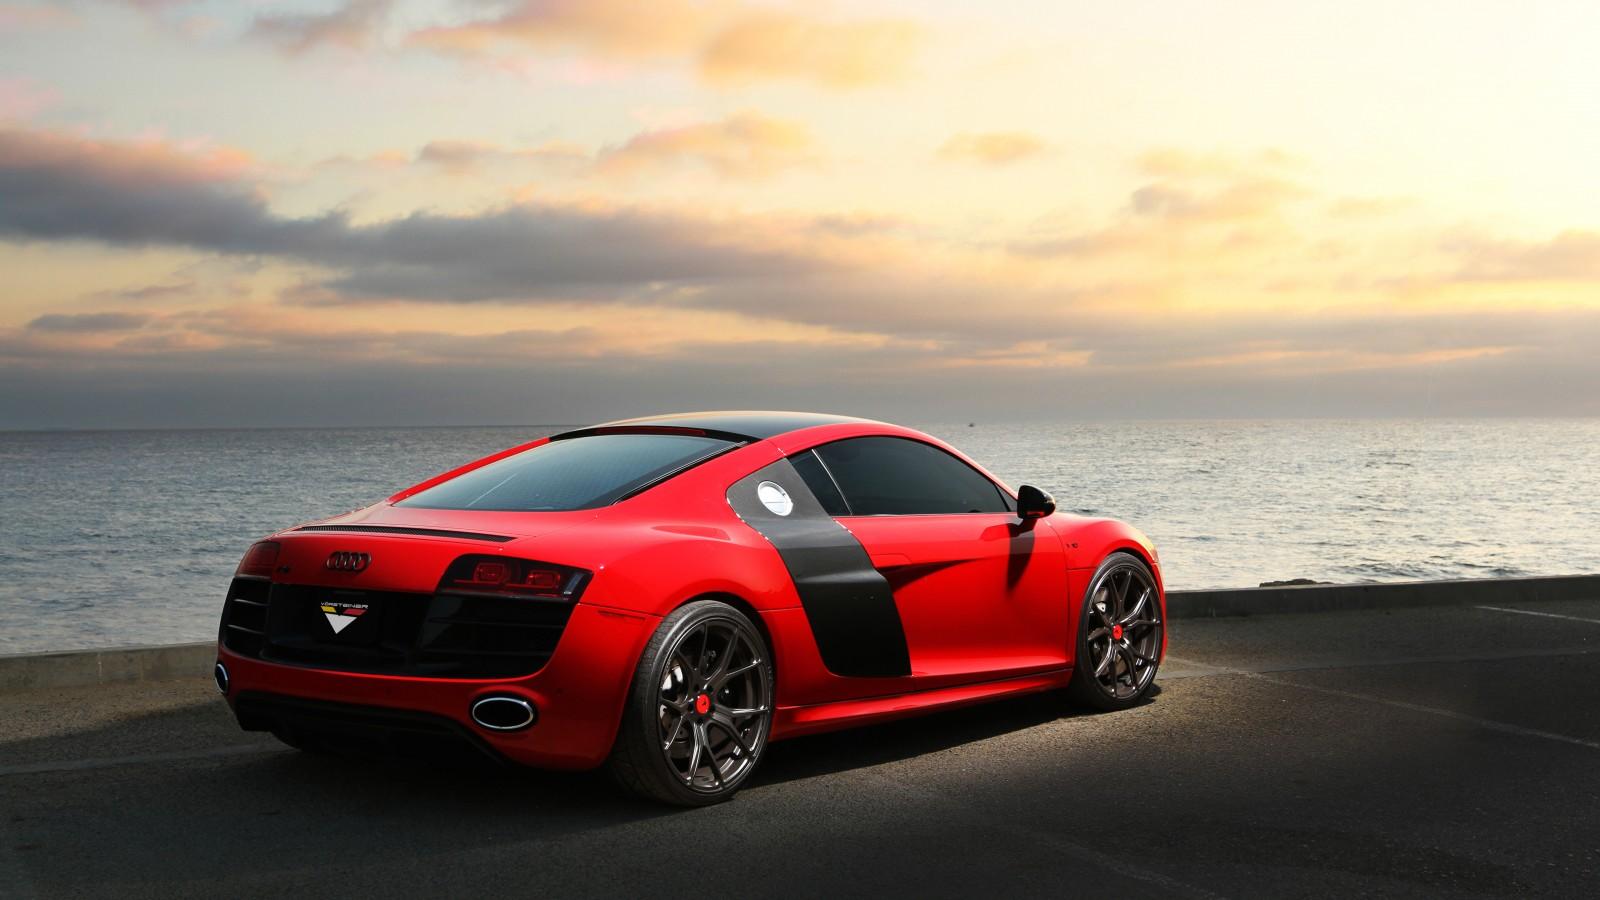 Vorsteiner Audi R8 Carbon Graphite 5K 2 Wallpaper | HD Car ...